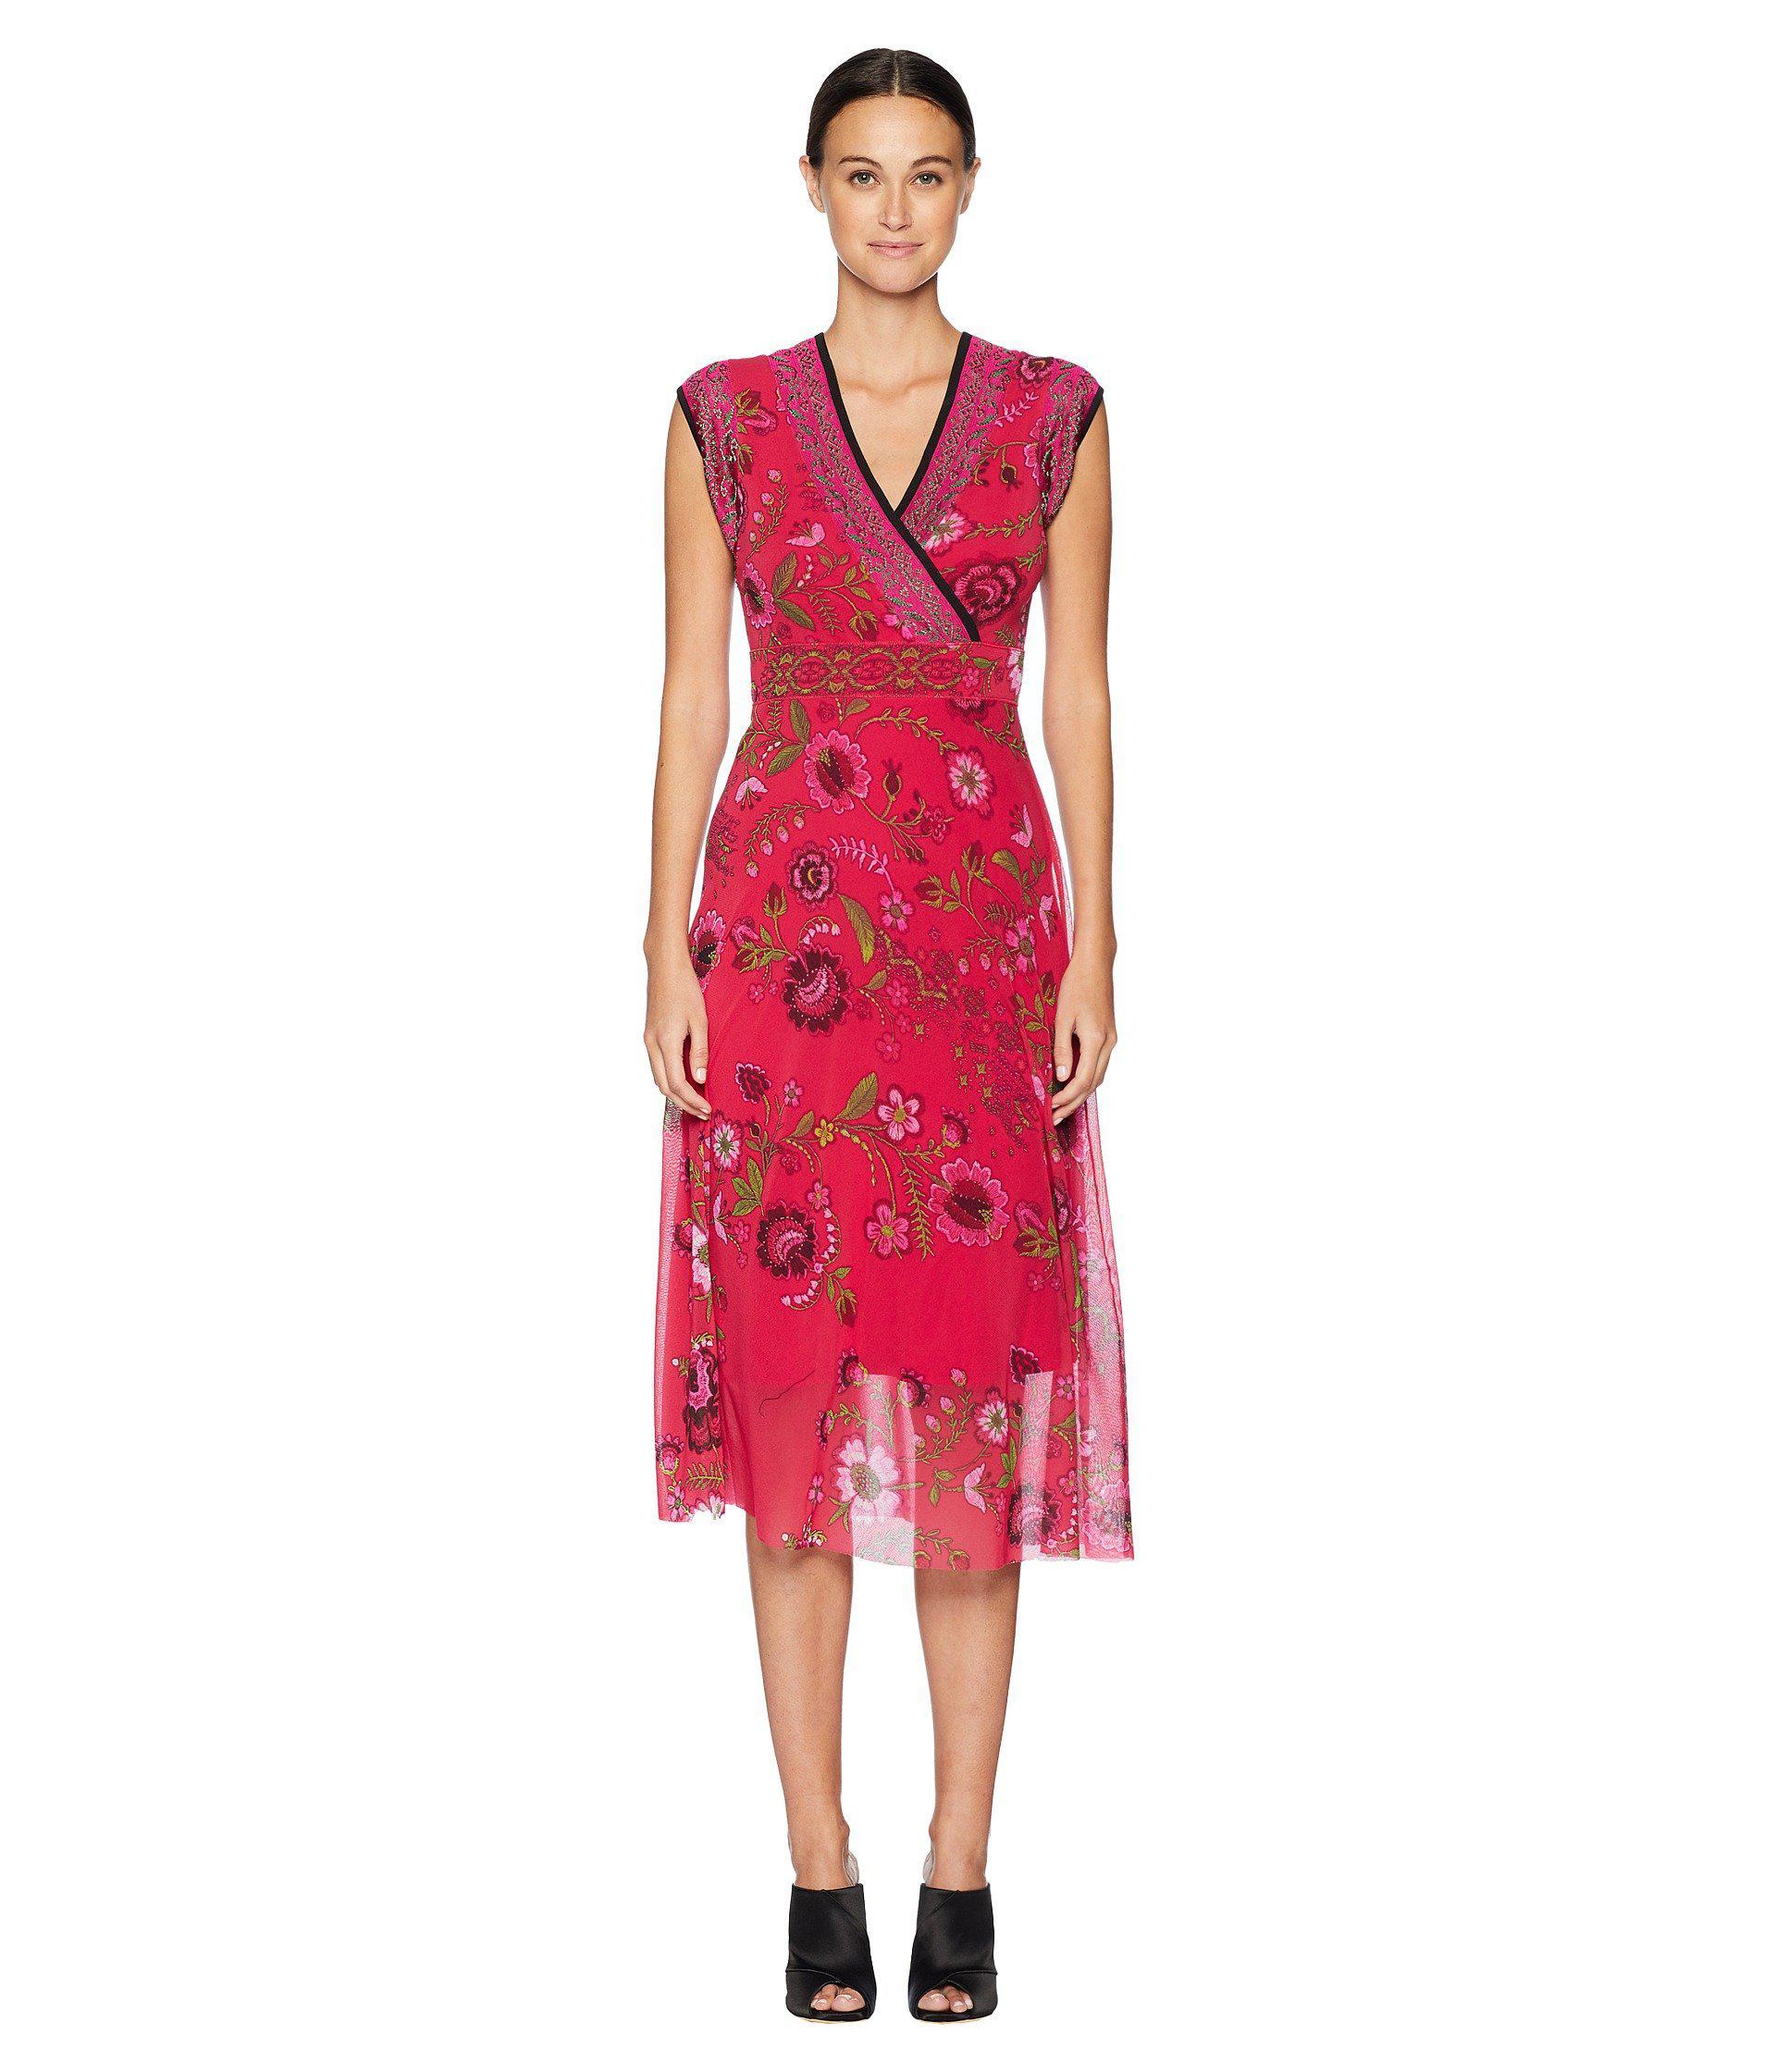 Lyst - Fuzzi Sleeveless Folk Flower Dress (petunia) Women s Dress in Red 392af28cc